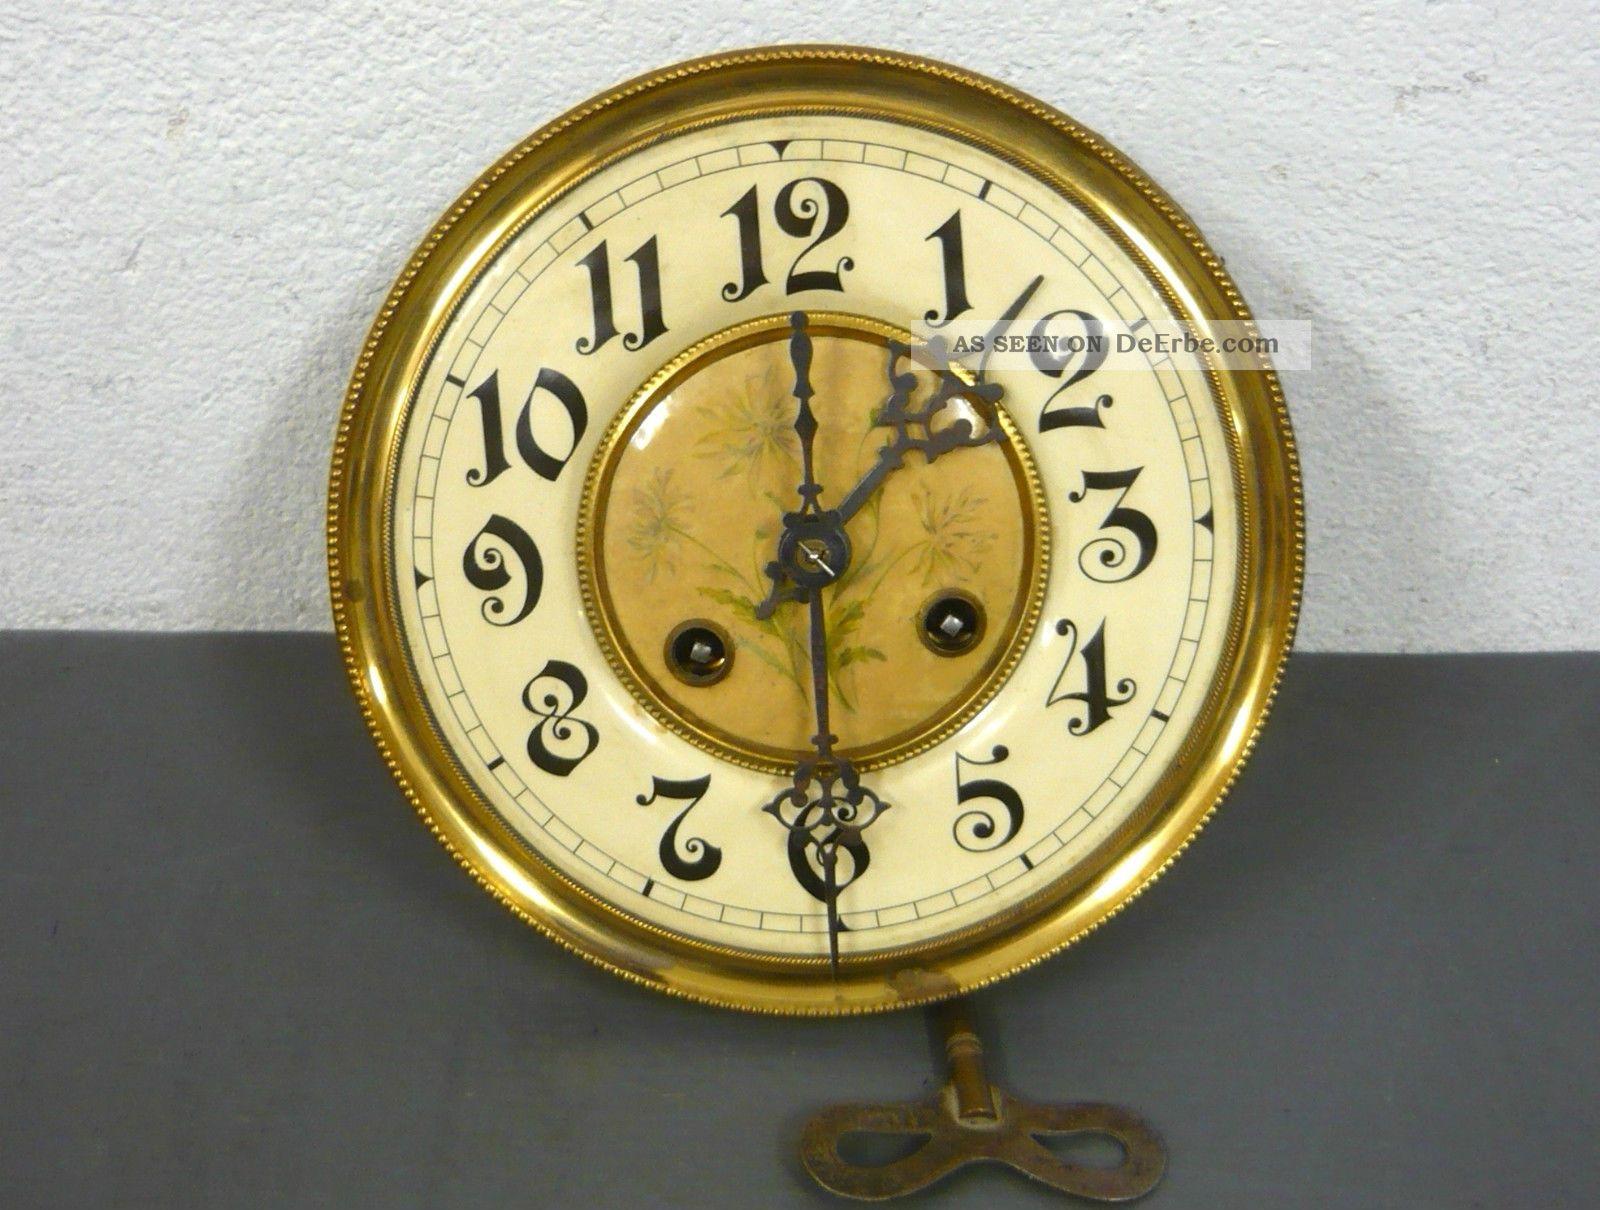 Antike wanduhr freischwinger jugendstil um 1900 mit adler gong - Antike wanduhren ...